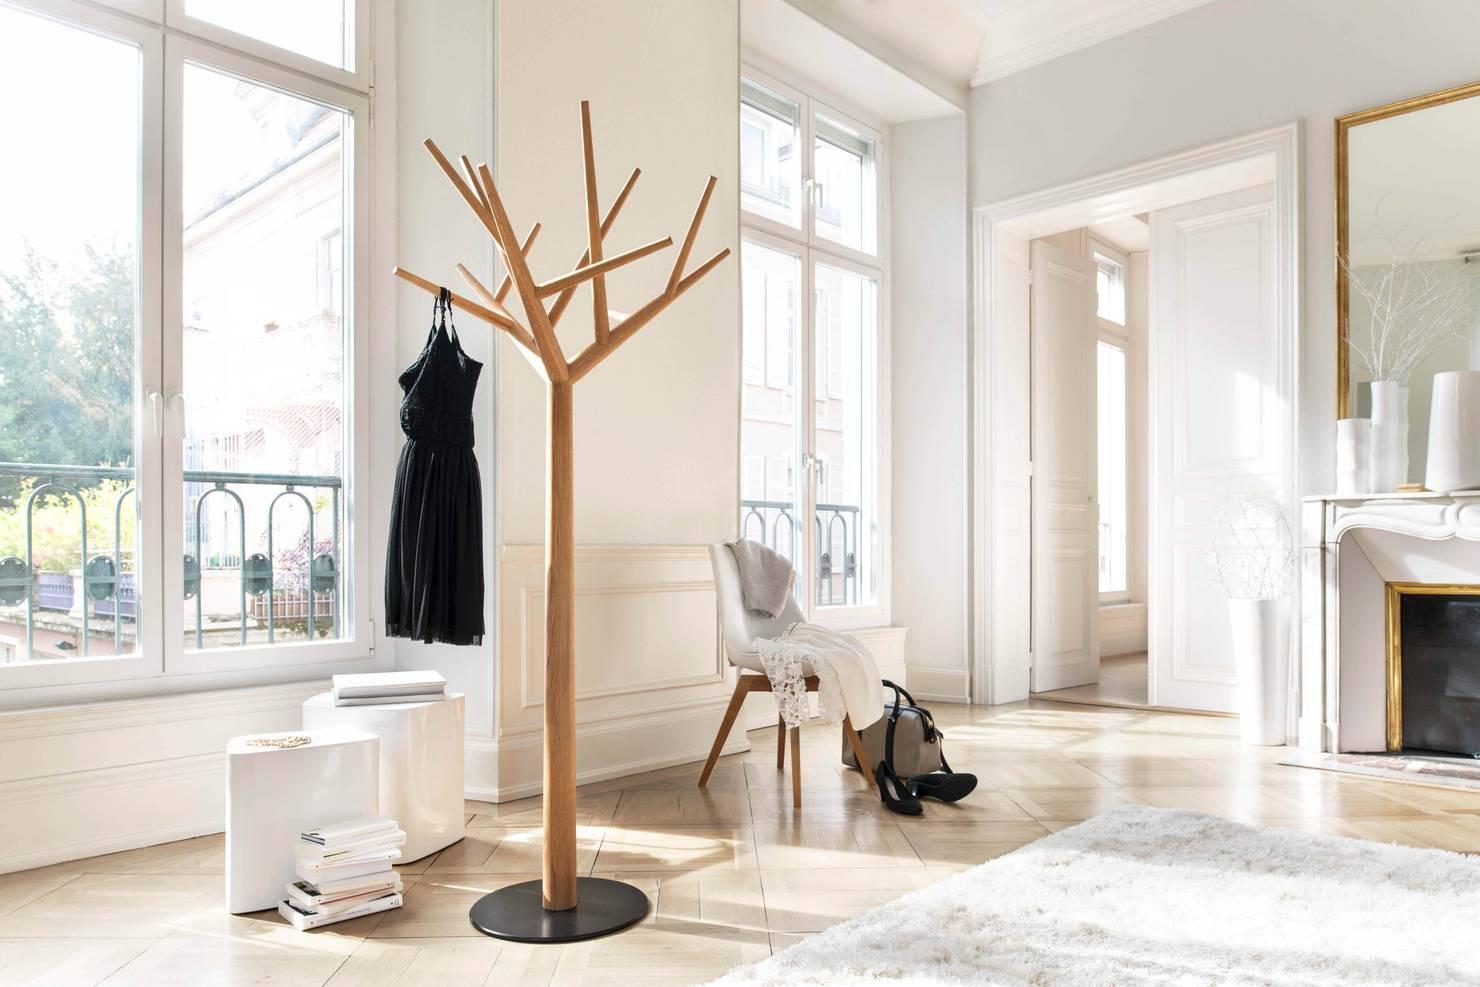 10 creative housewarming gift ideas